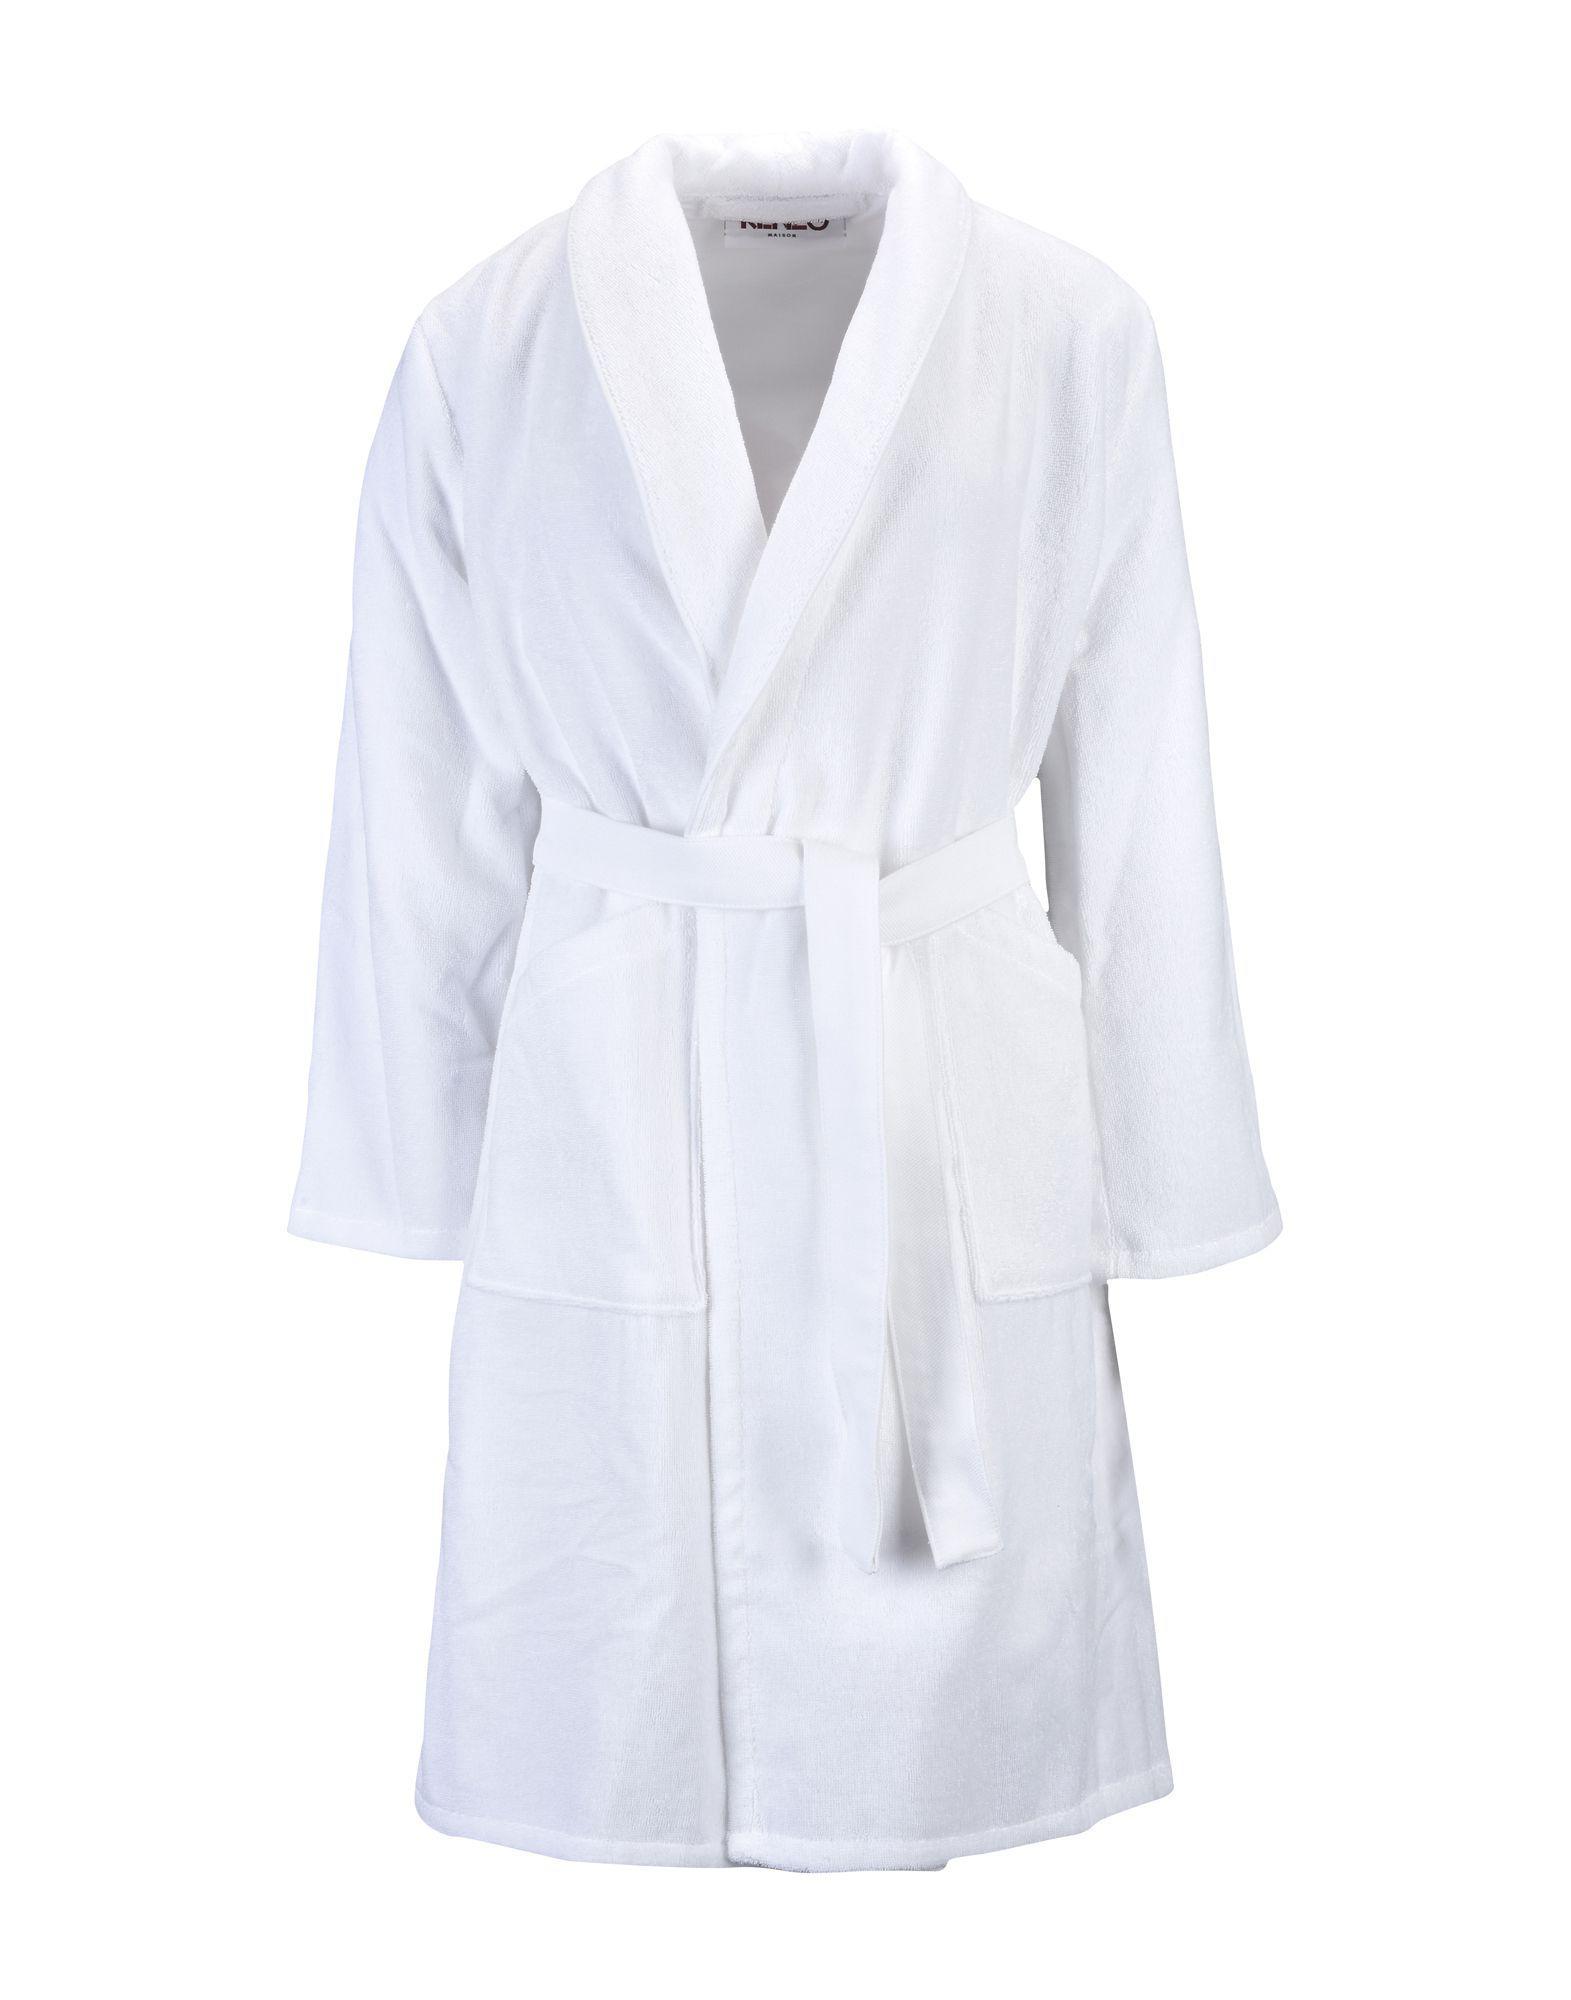 KENZO - White Towelling Dressing Gown for Men - Lyst. View fullscreen 72bc3e3fb